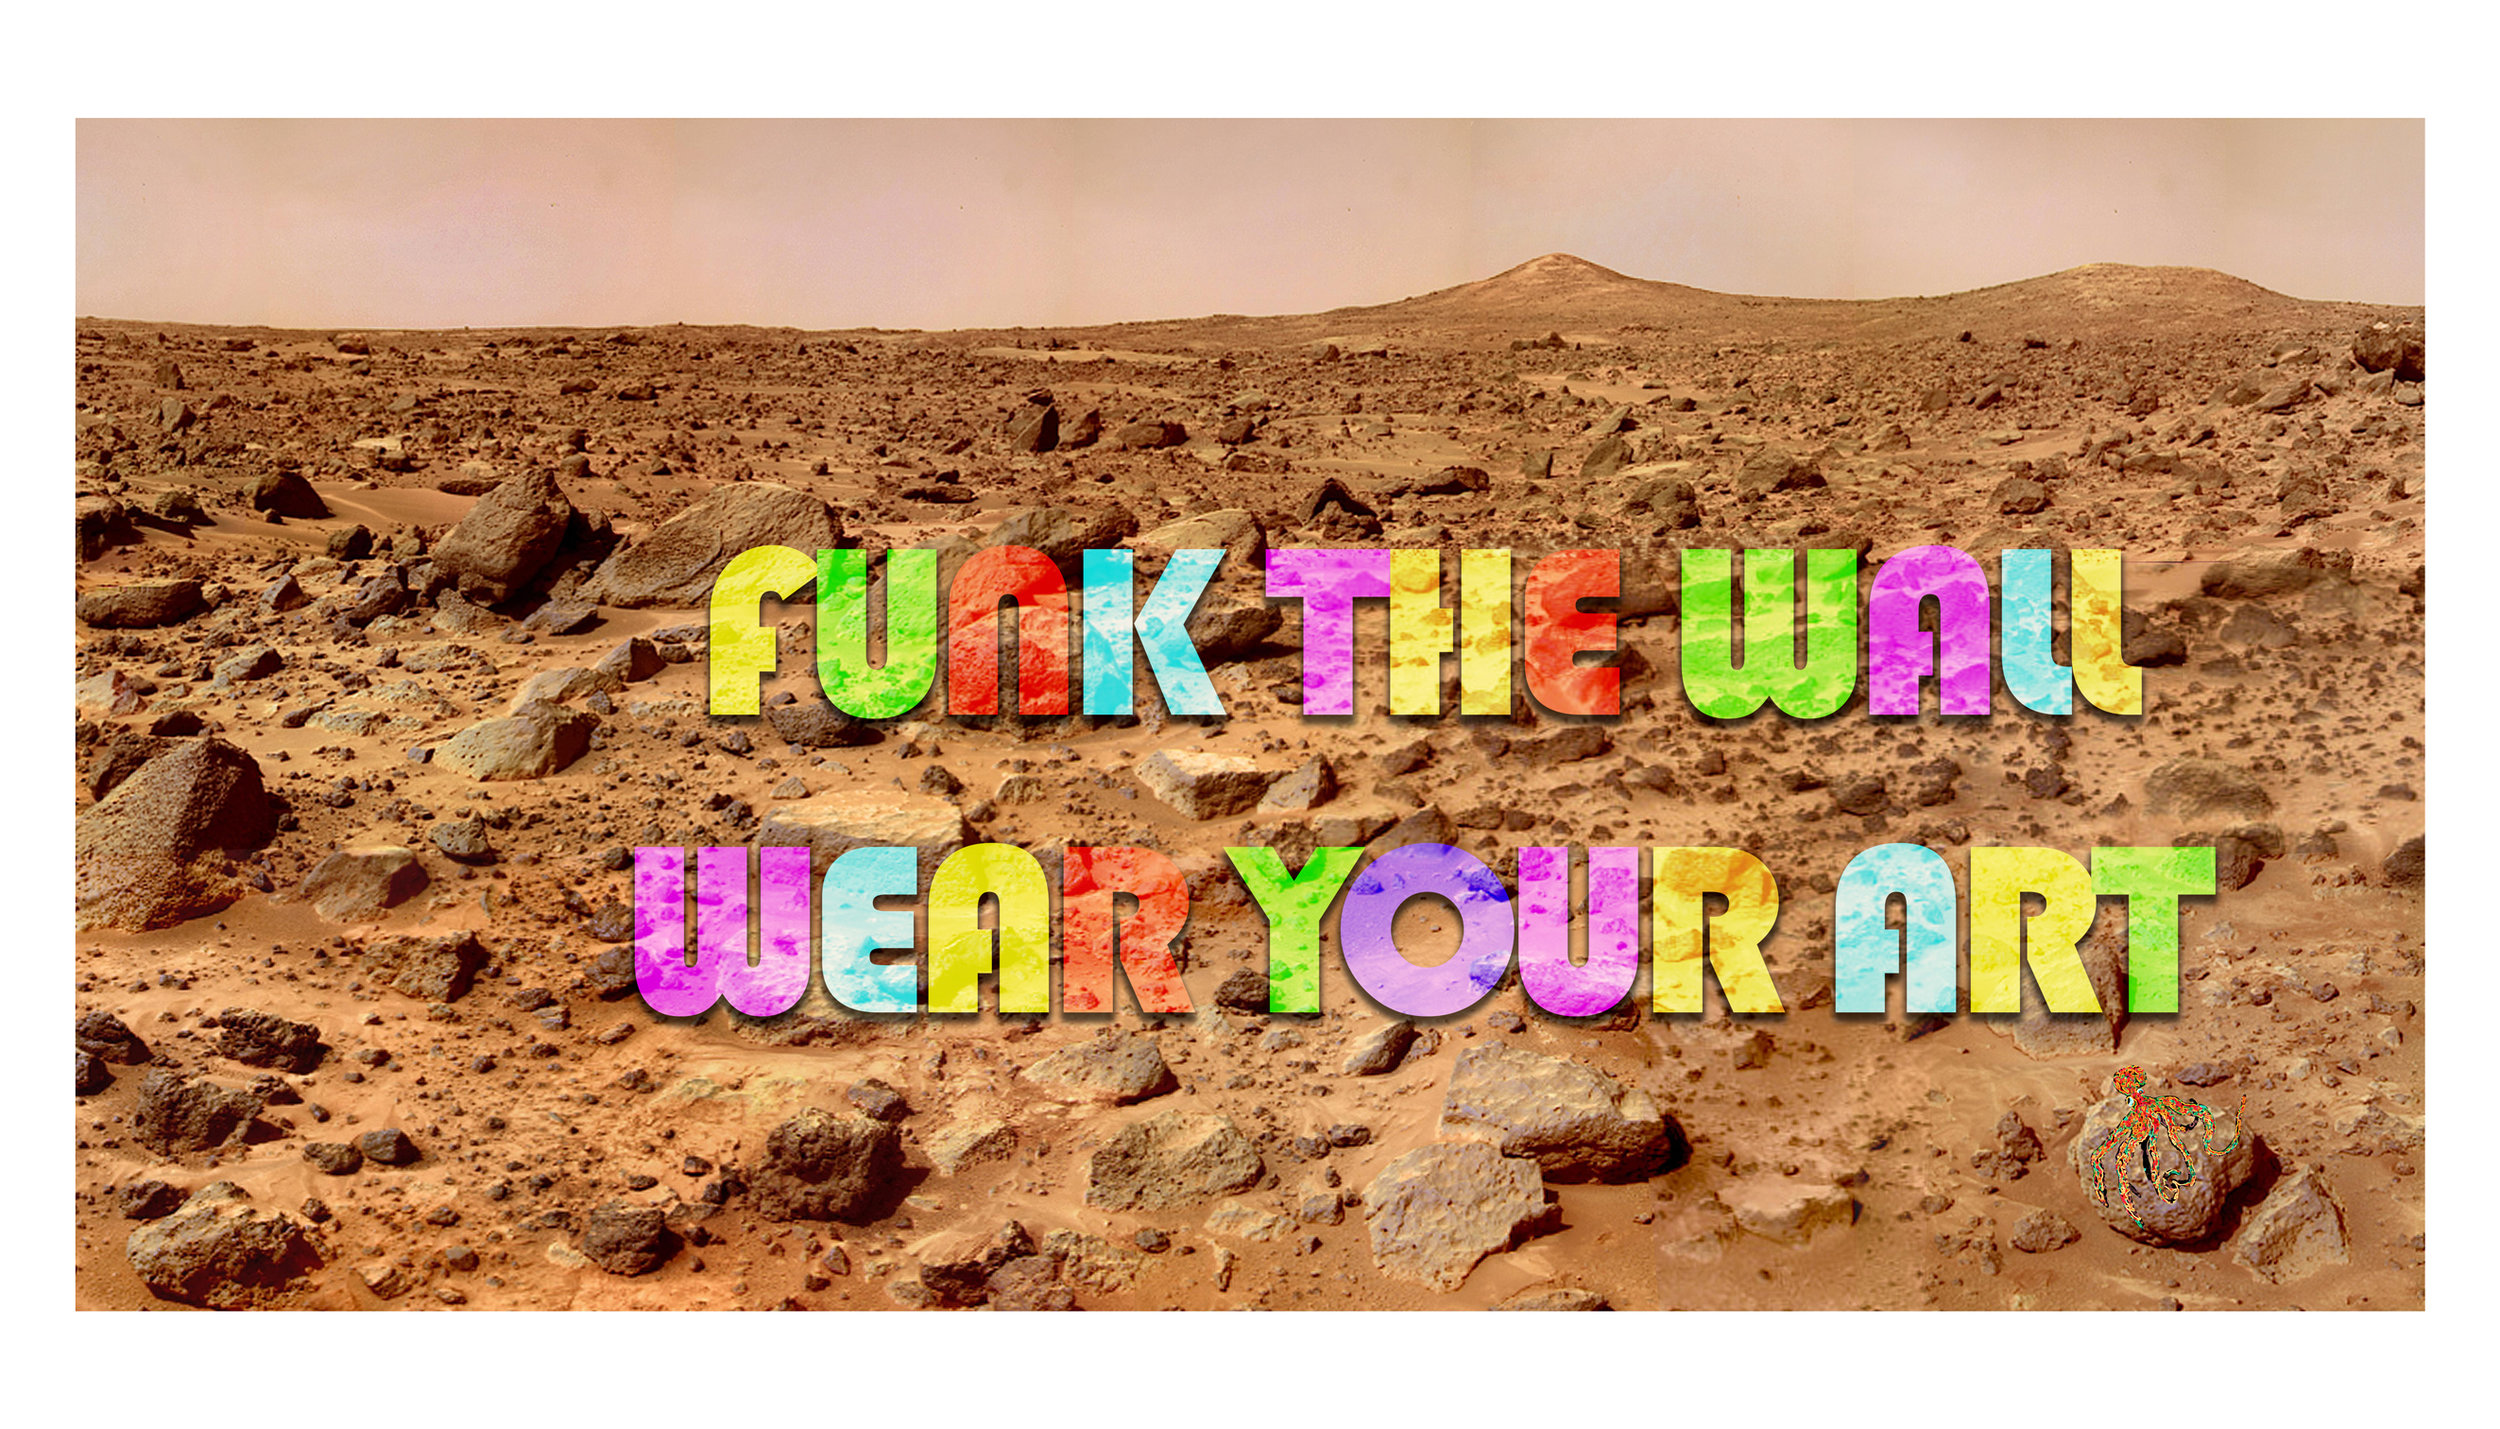 The Motherland of El-Skel and friends. Taken @Funkytown, Sector 69, Mars